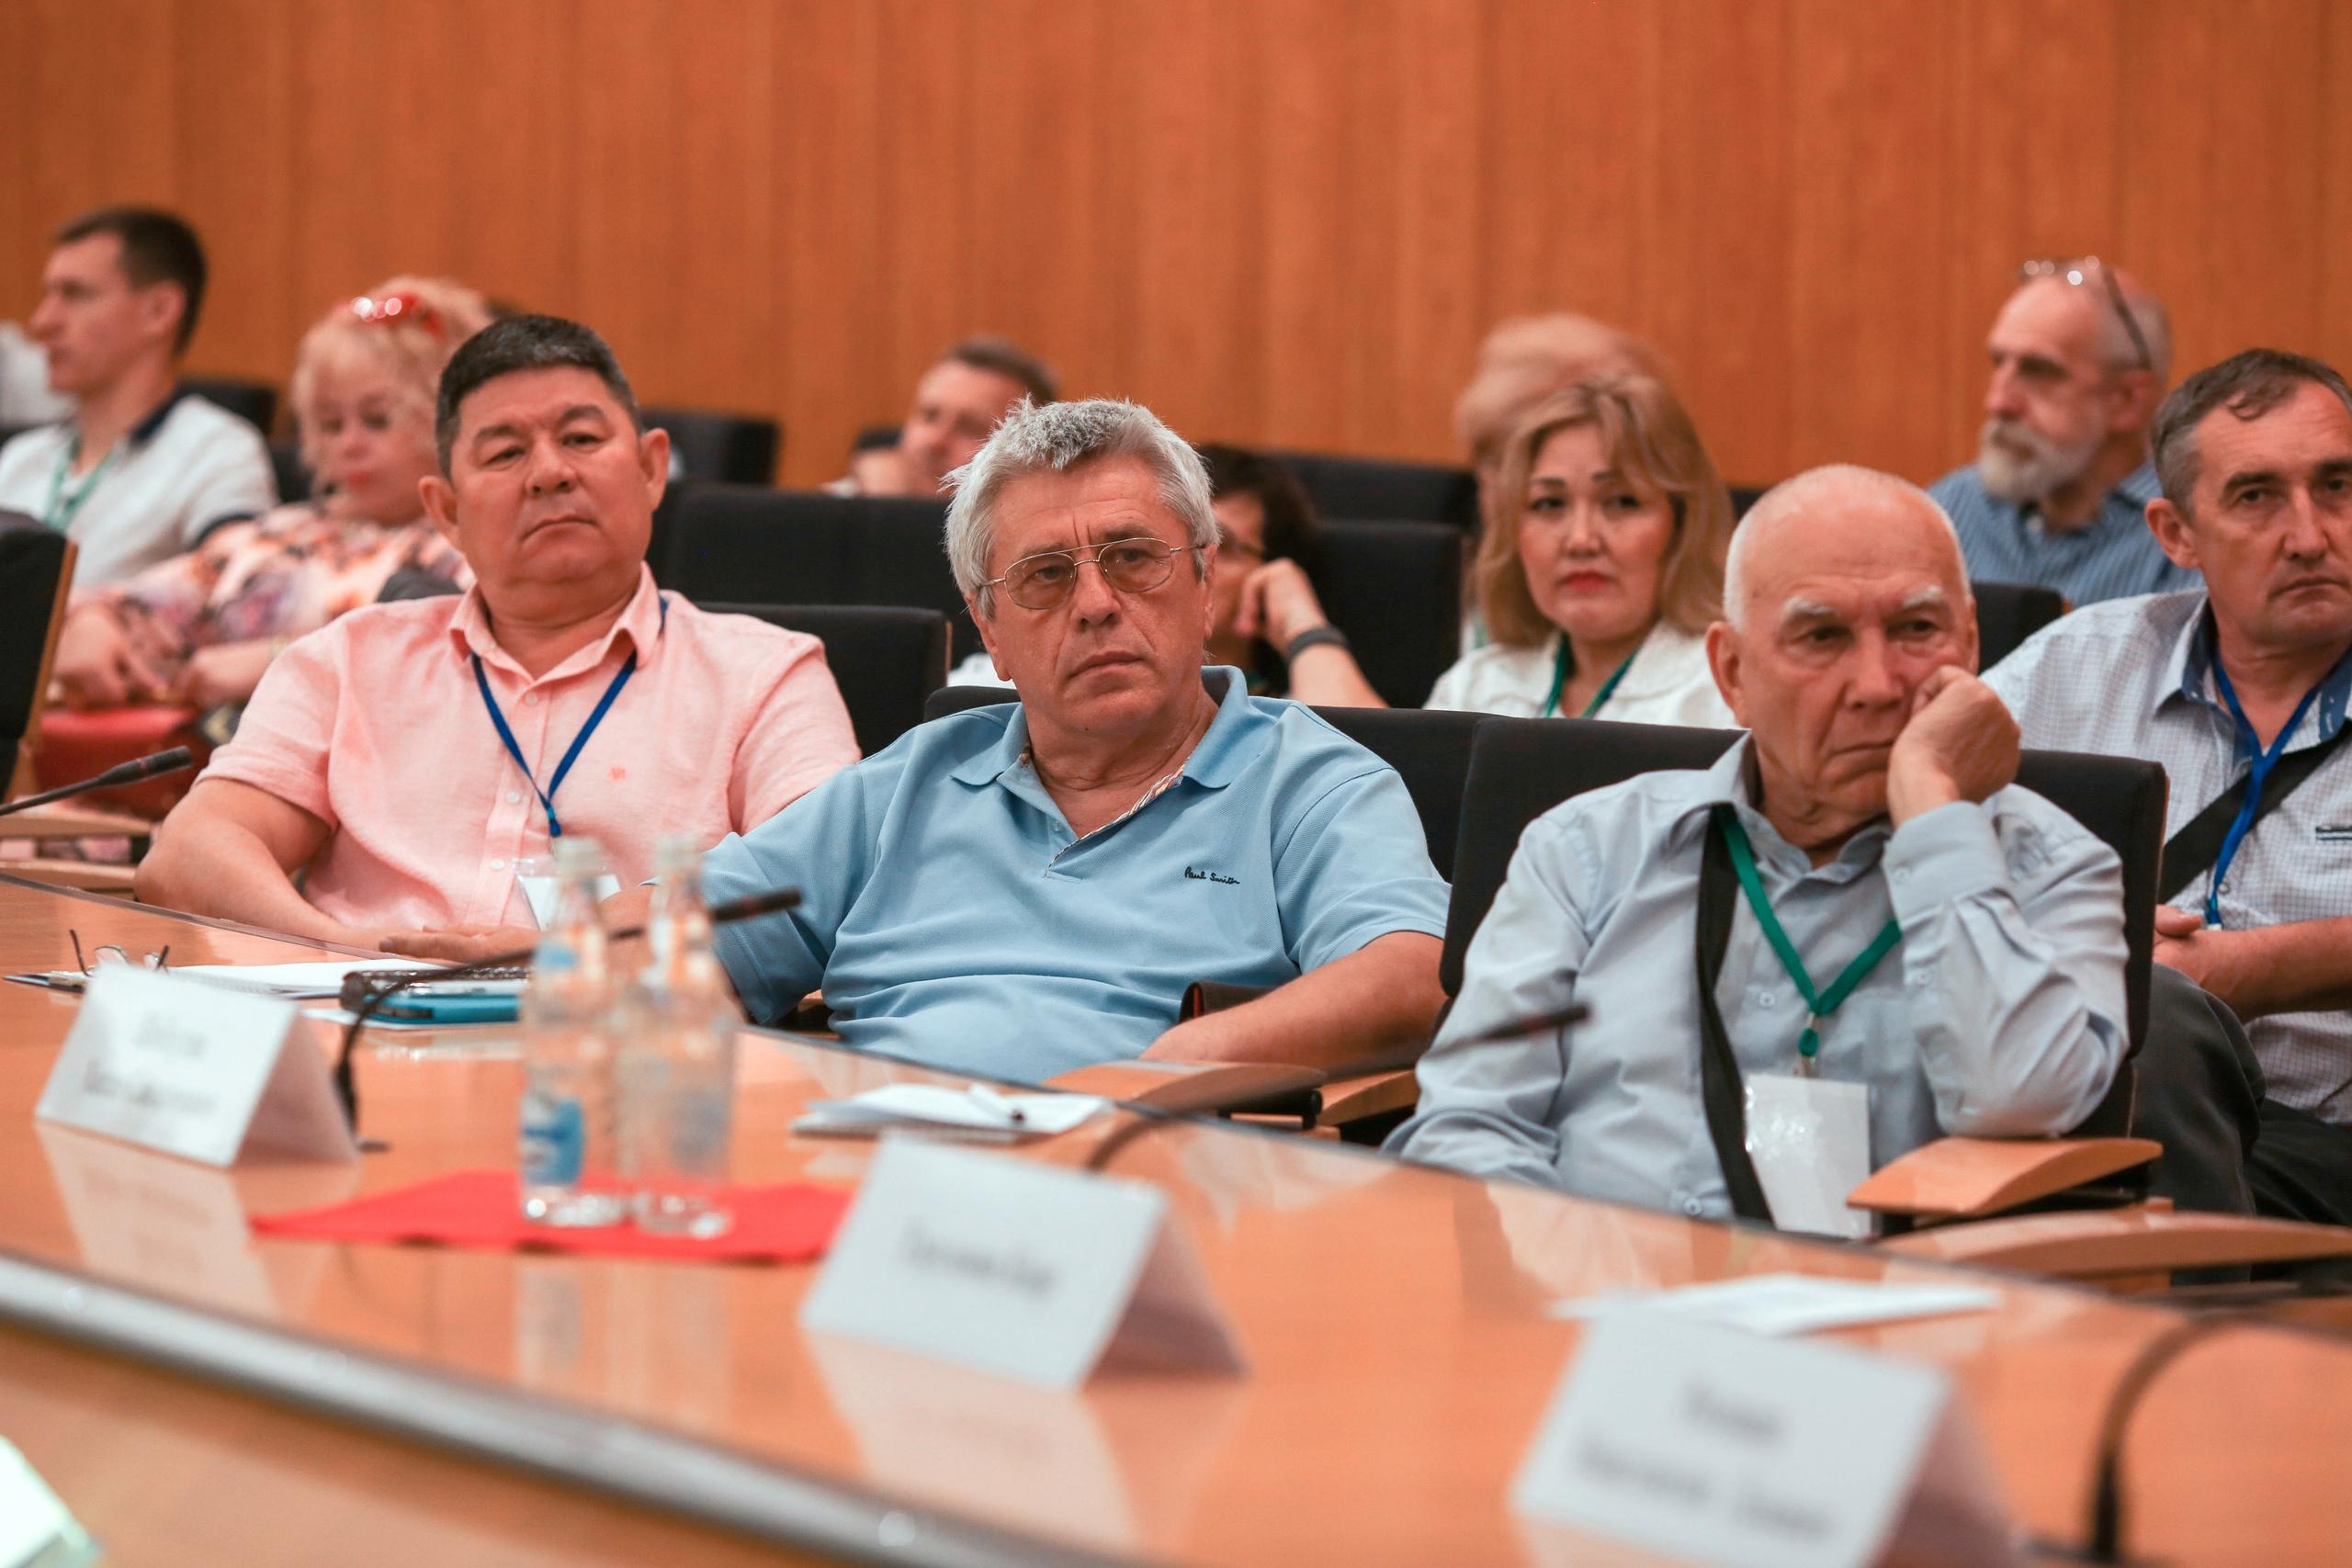 YwSi Z4WdzY - Состоялась Международная Конференция в Доме Правительства 7 июня 2019г.